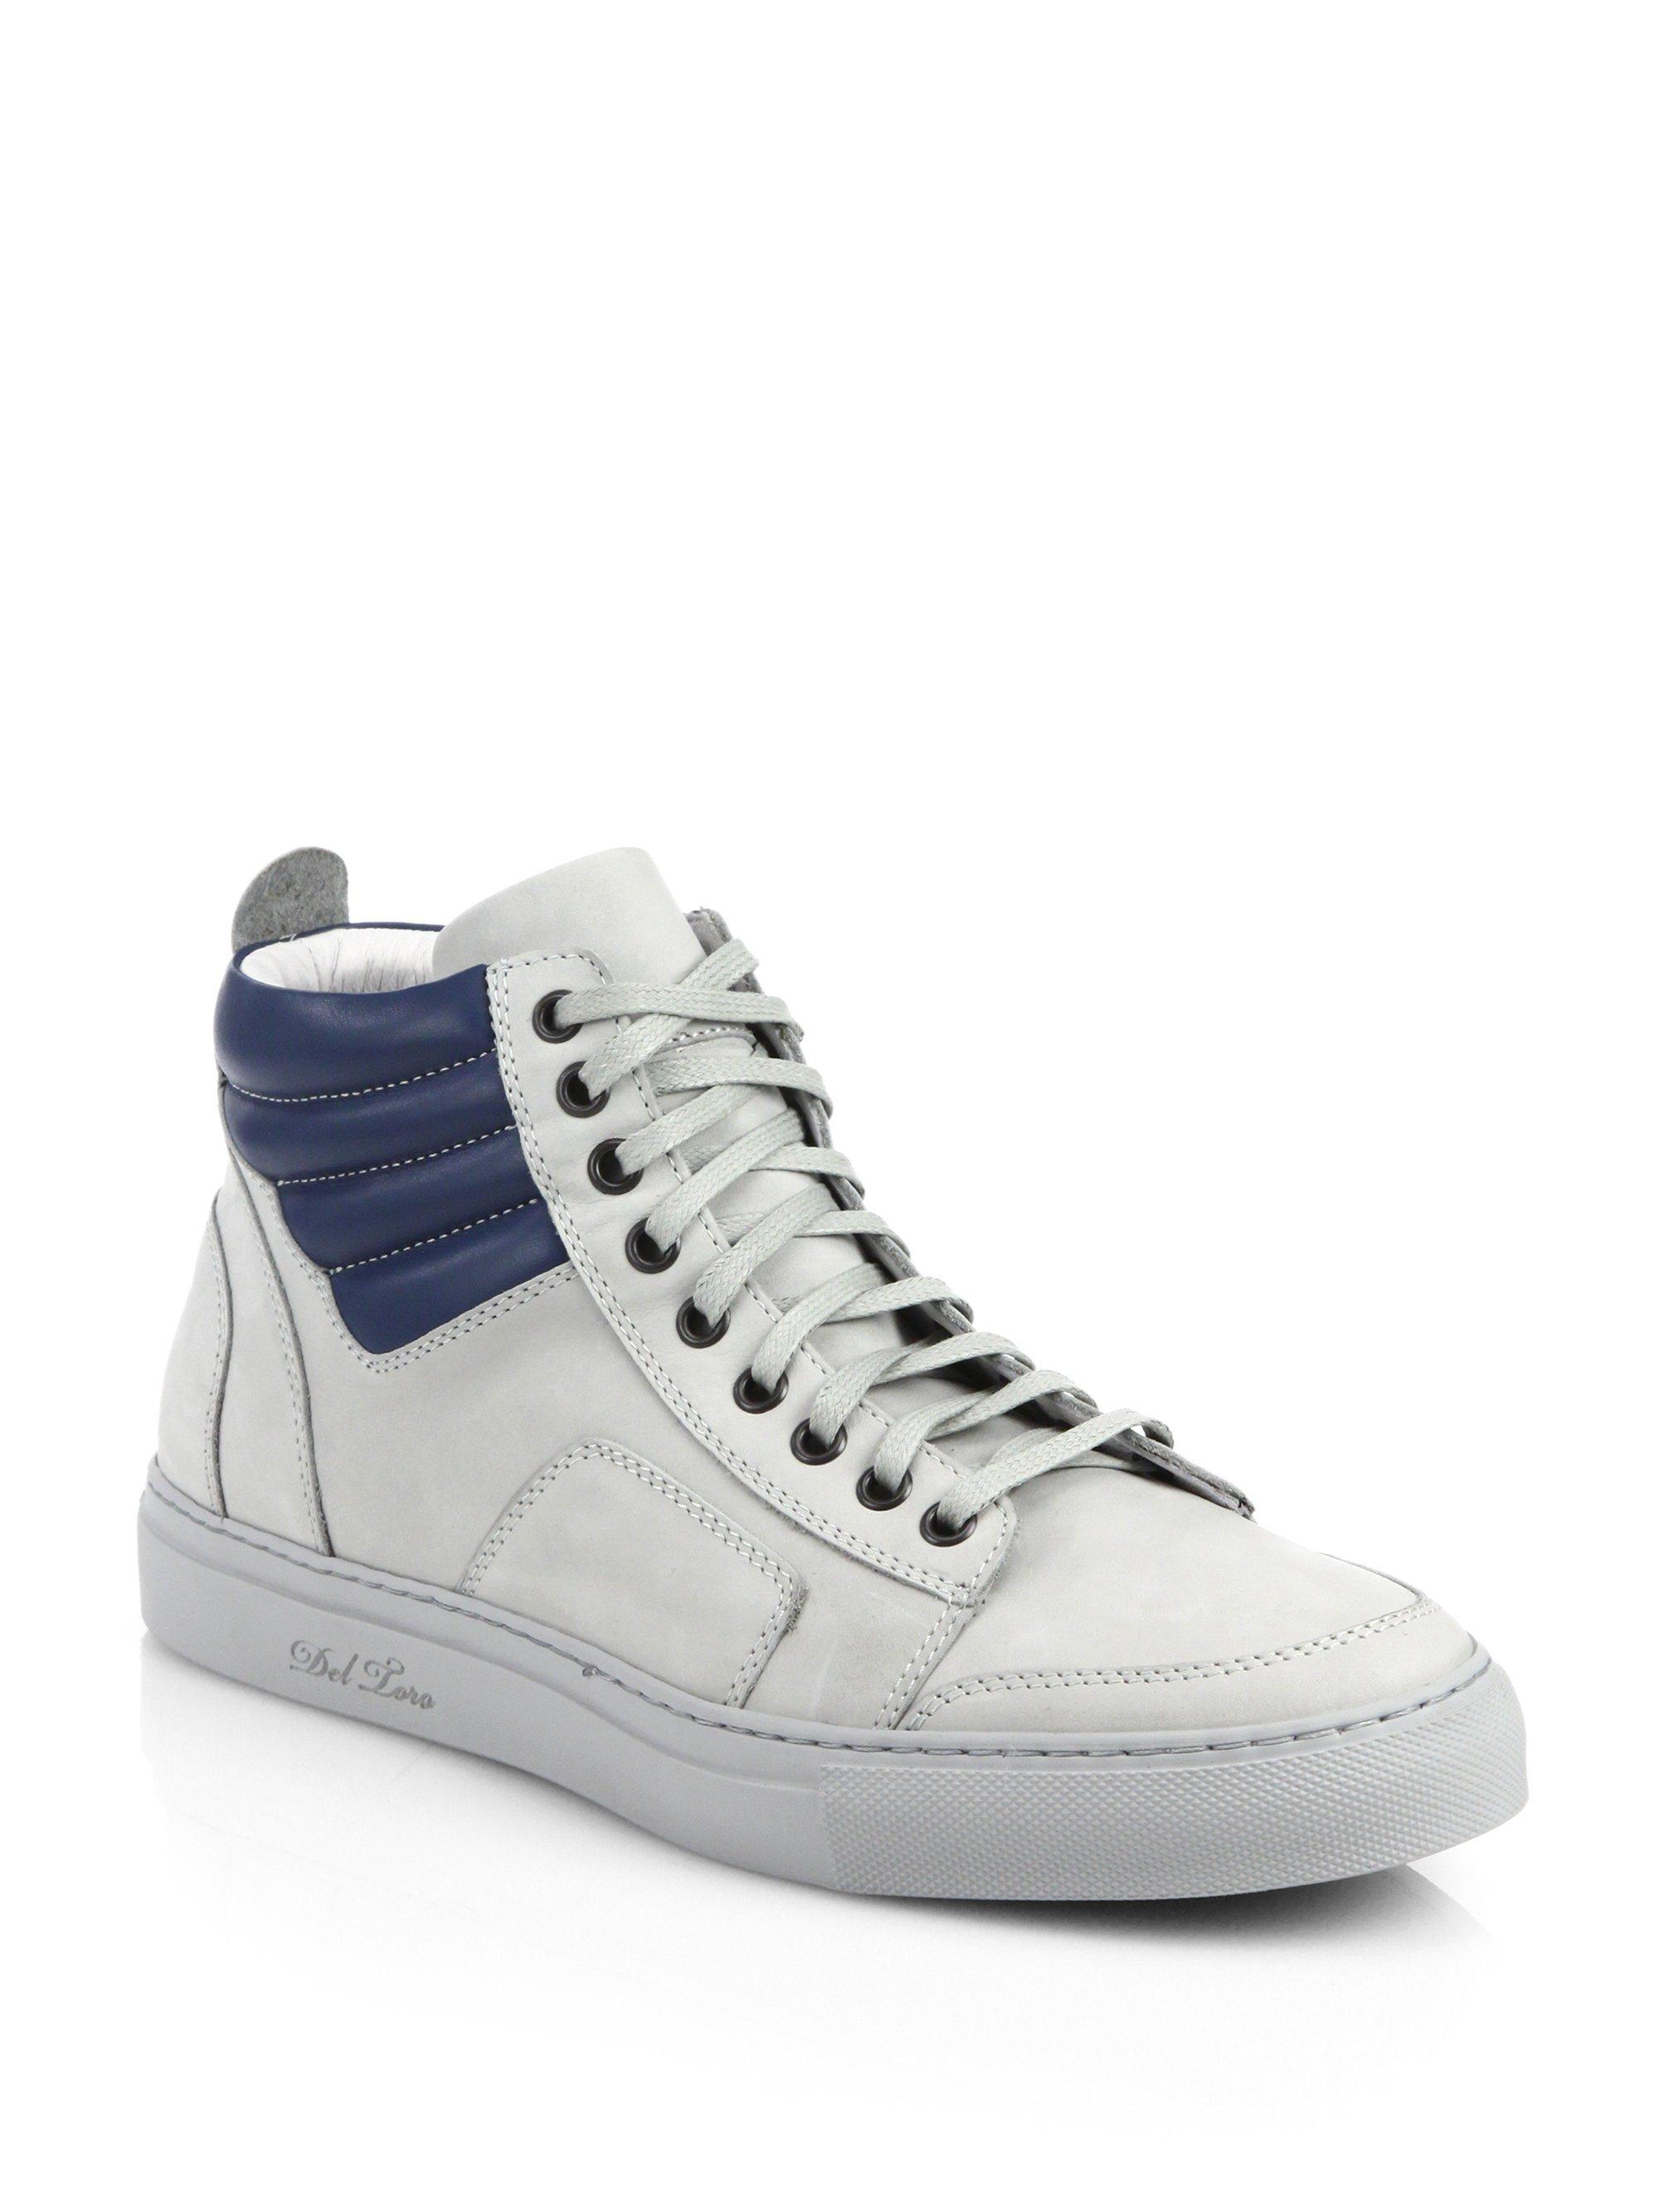 DEL TORO Neon Boxing Sneakers PrxMgikx